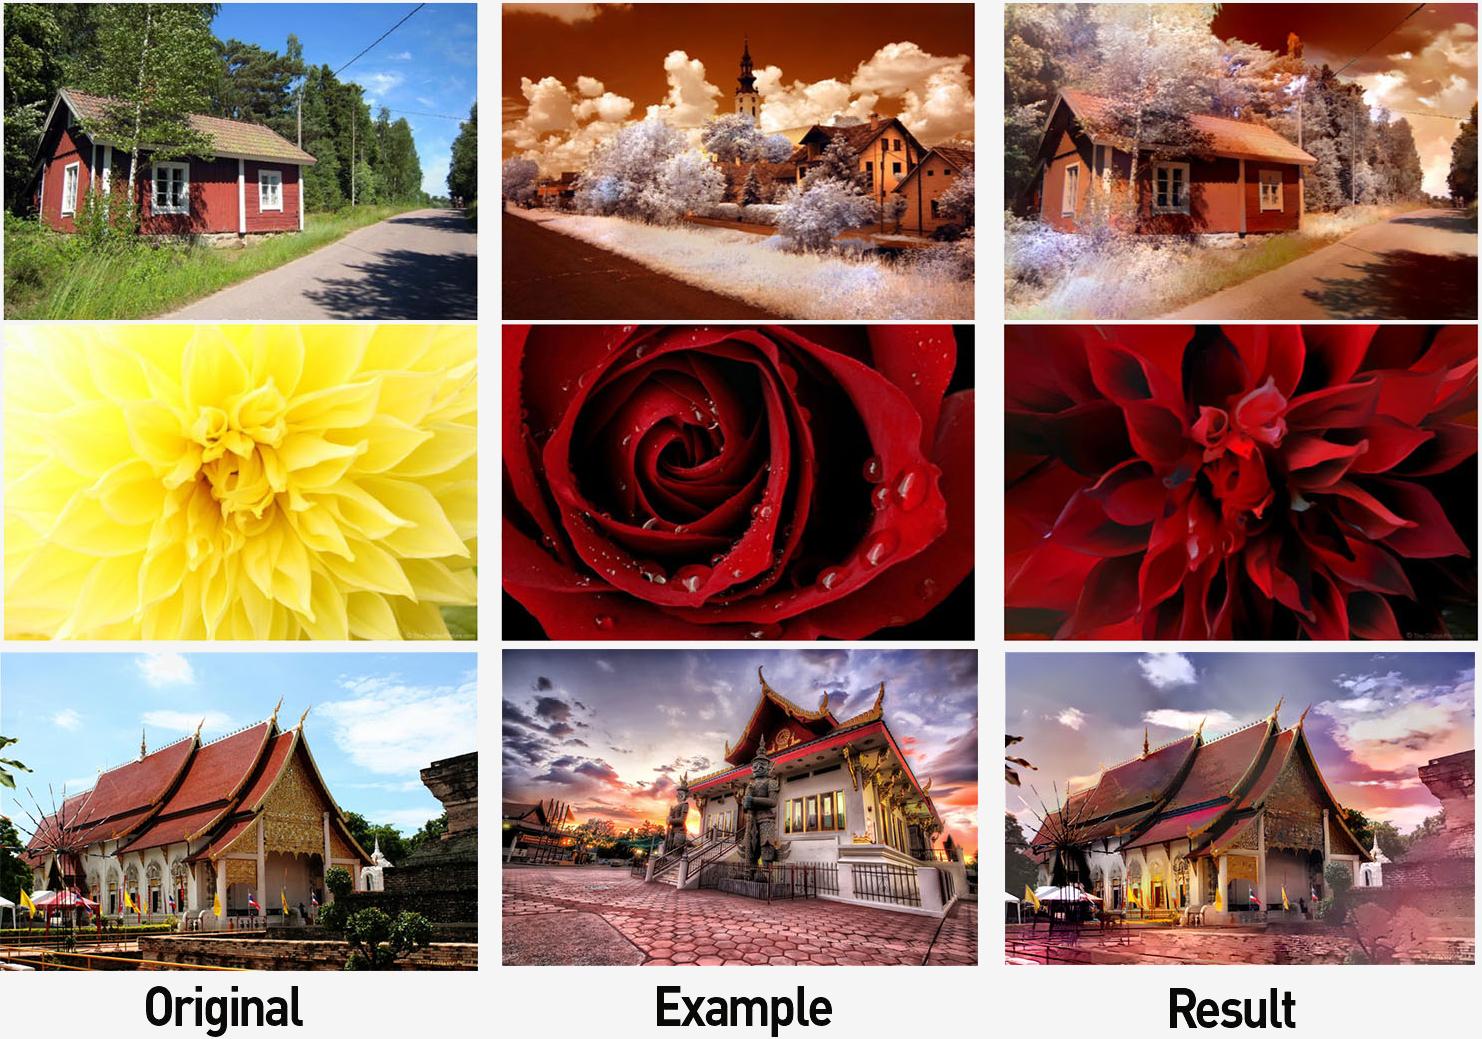 adobe, photography, photoshop, cornell university, post-processing